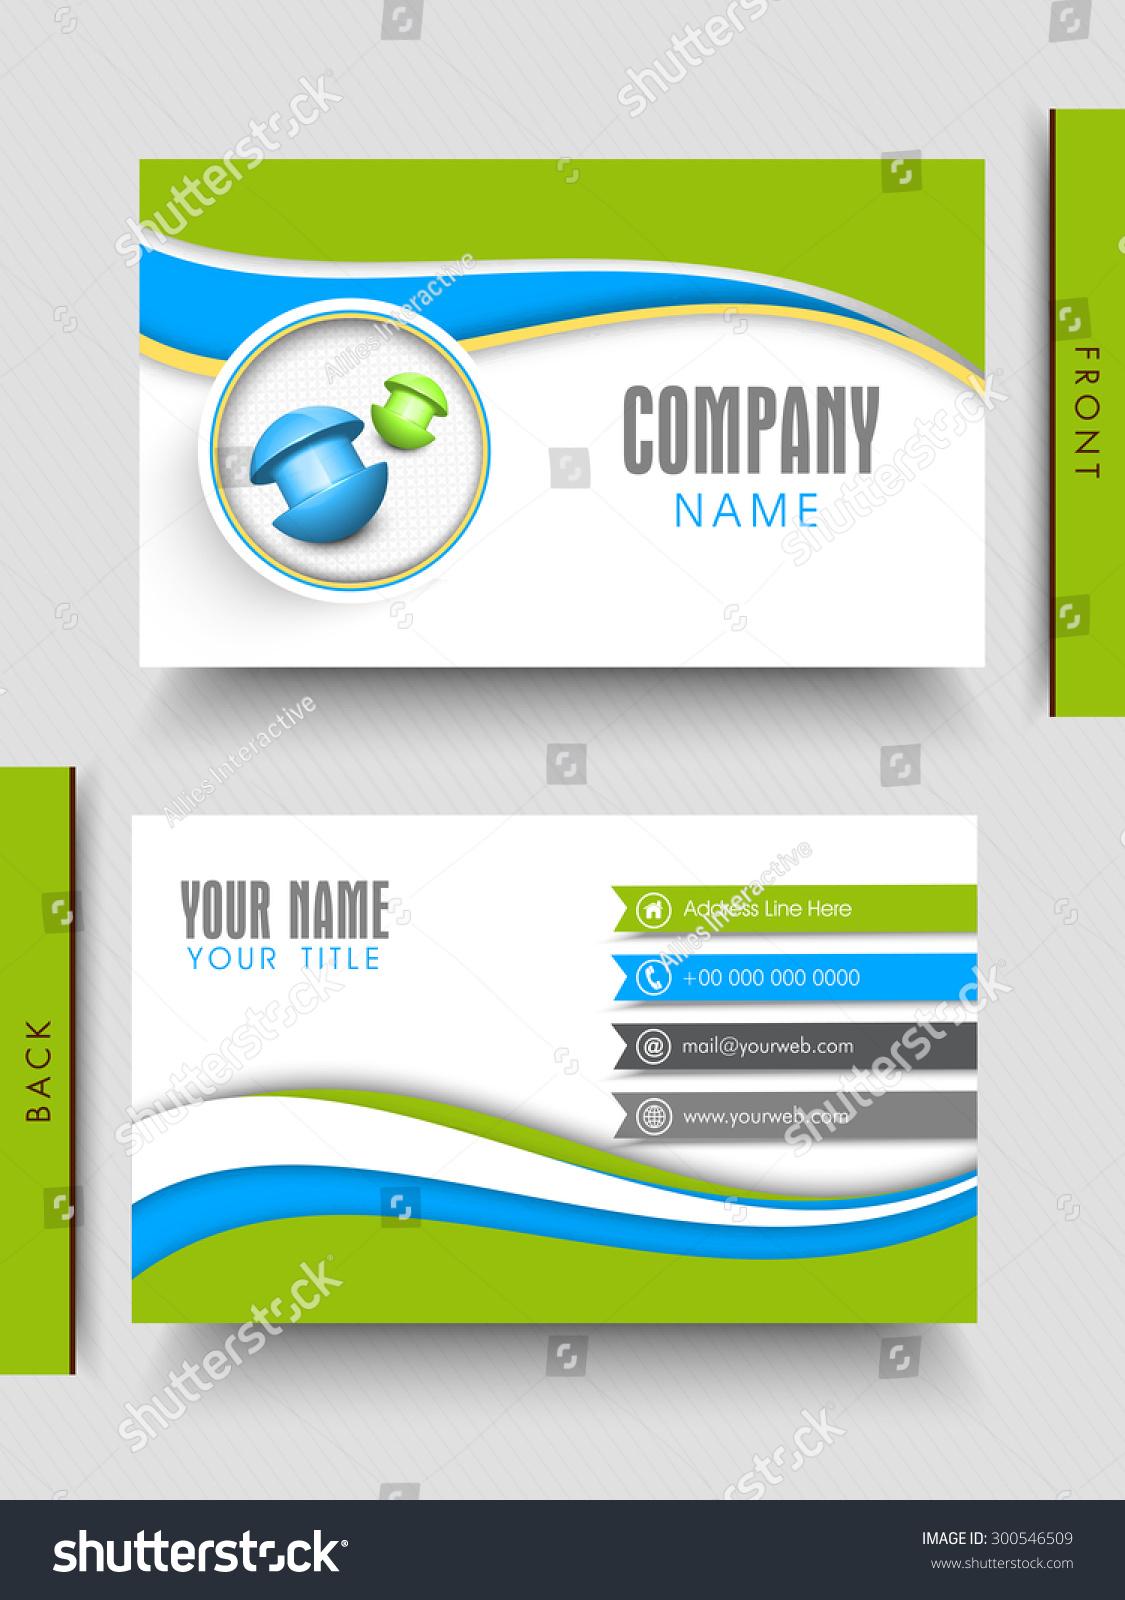 Creative business card design front back stock vector 300546509 creative business card design with front and back side presentation on gray background colourmoves